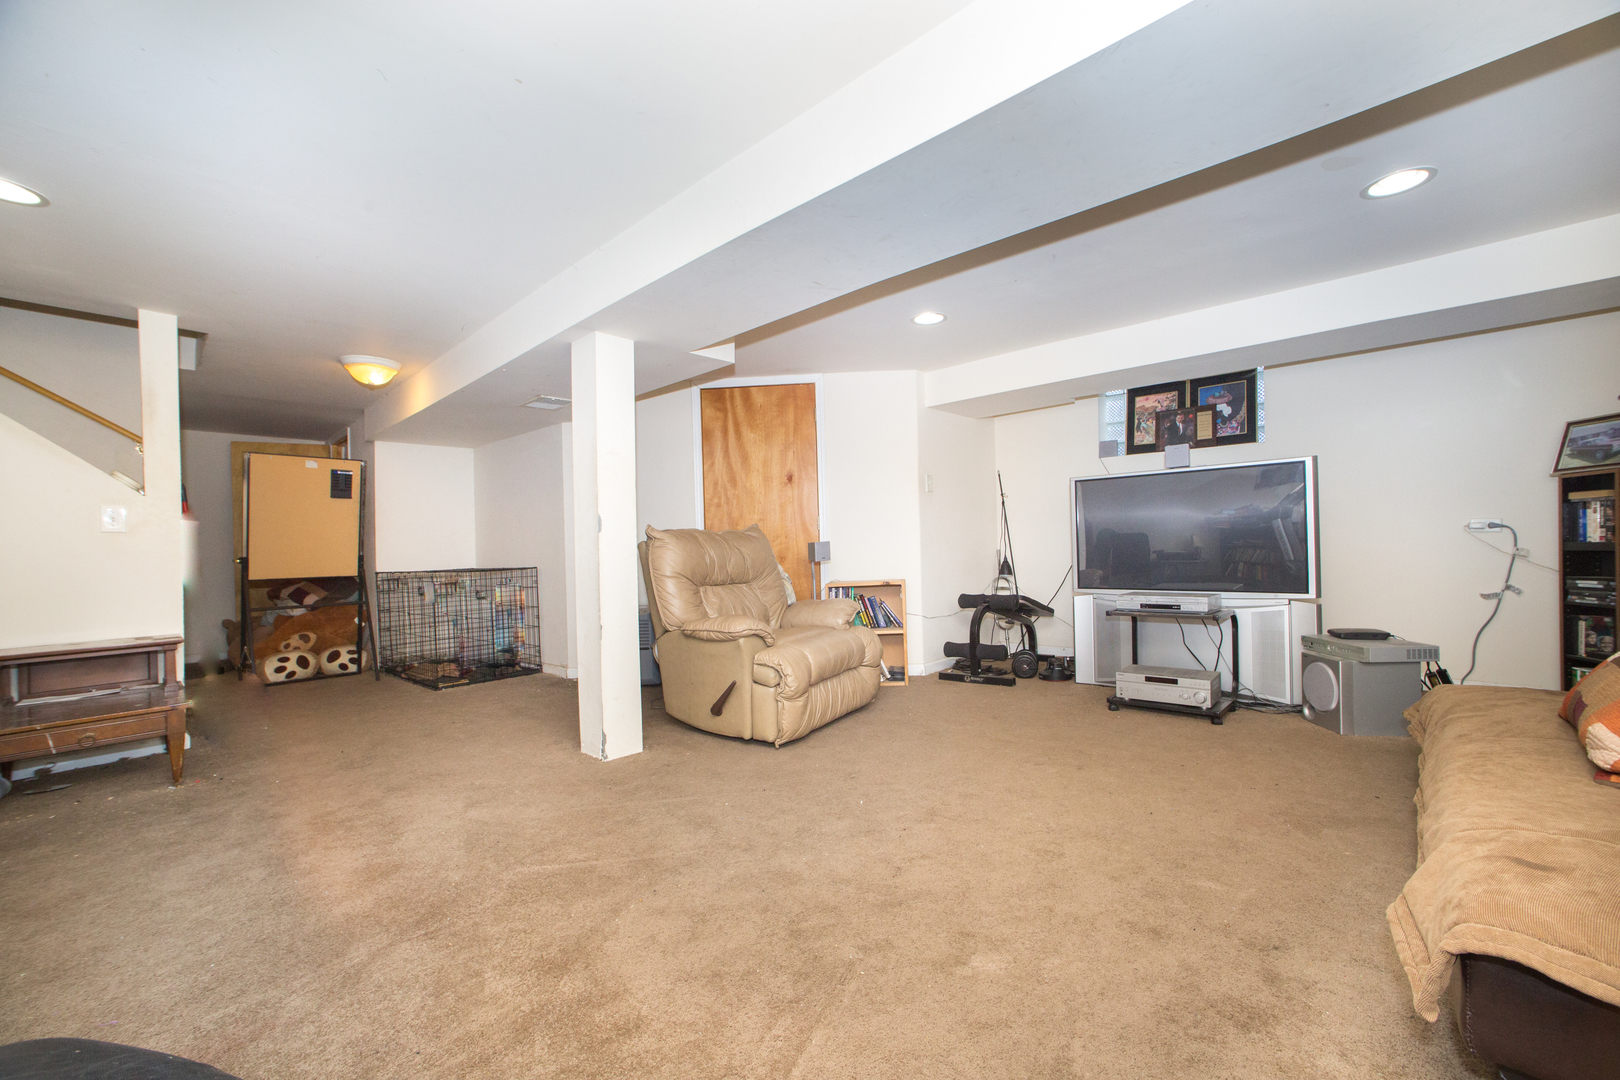 8121 South Whipple, CHICAGO, Illinois, 60652